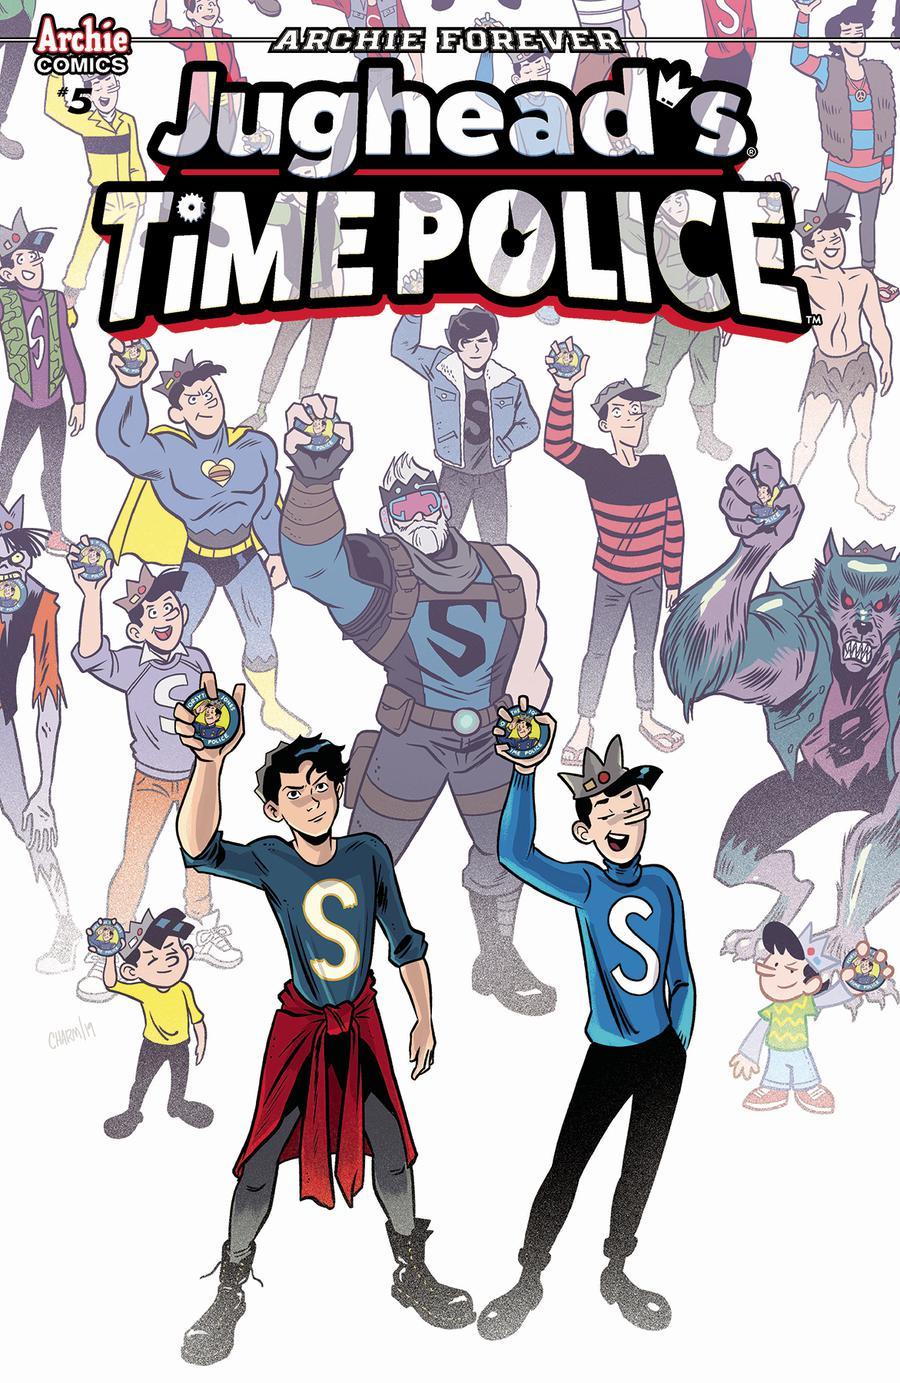 Jugheads Time Police Vol 2 #5 Cover A Regular Derek Charm Cover